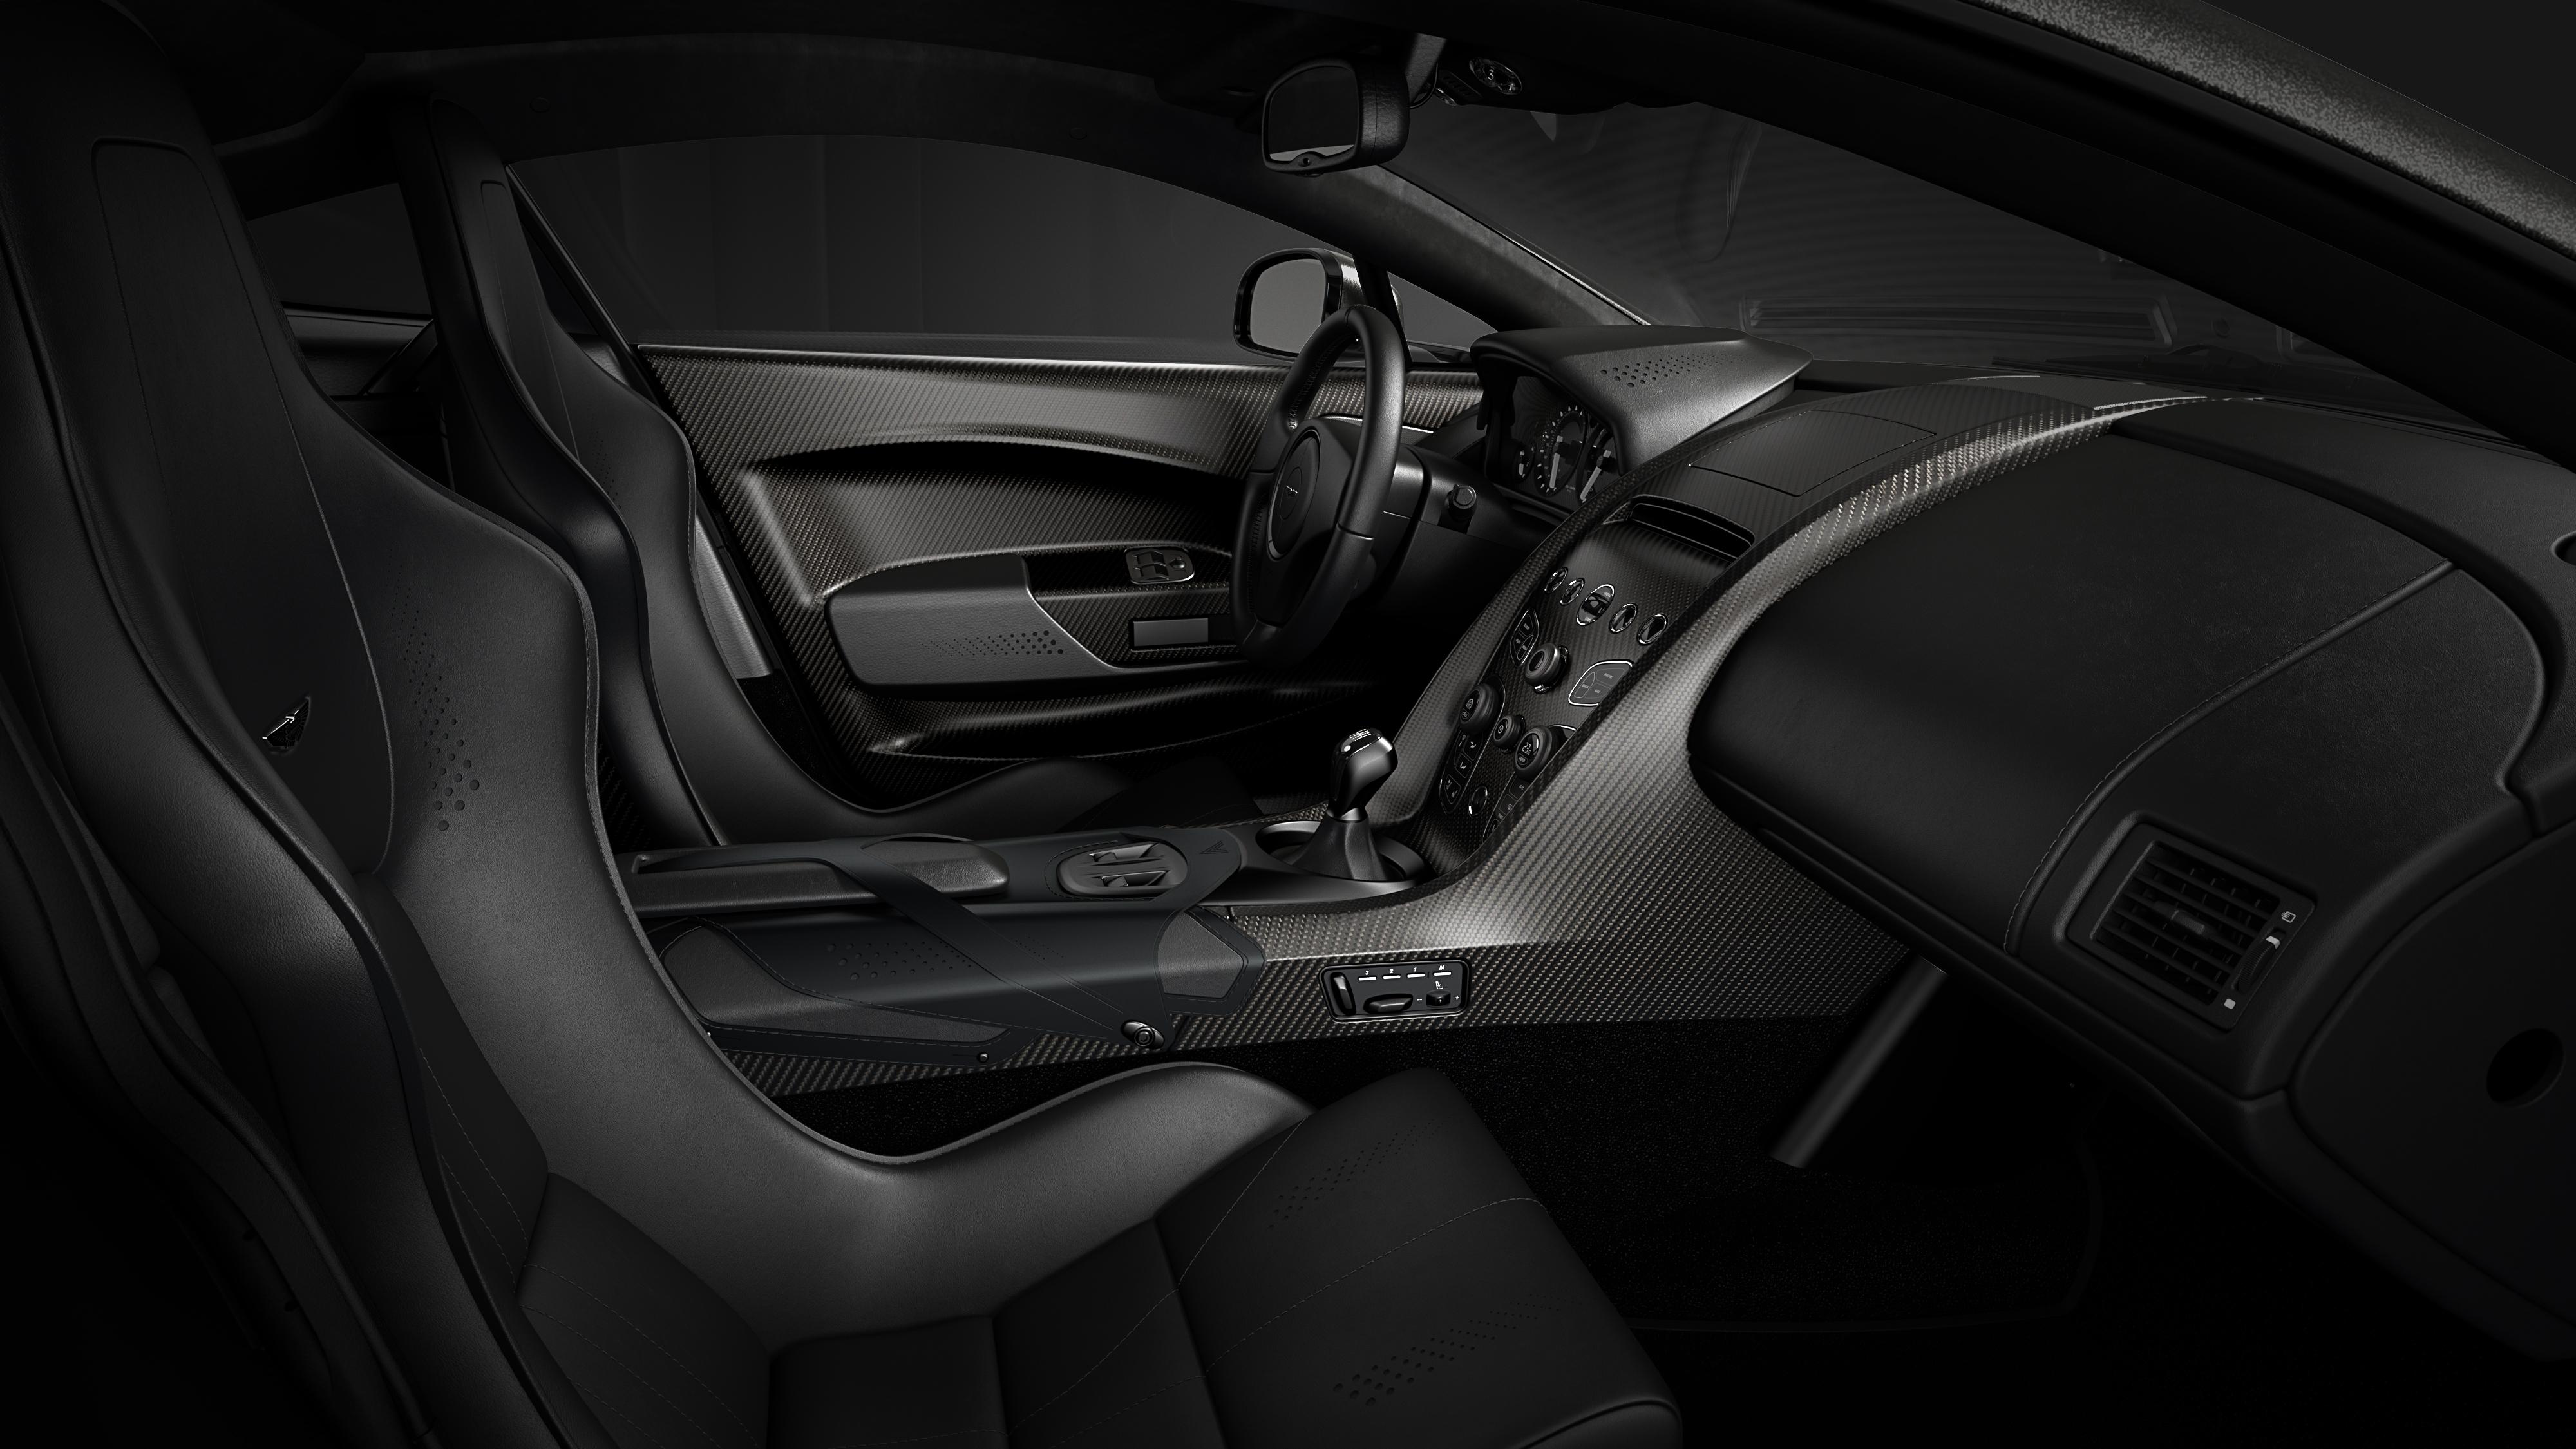 Aston Martin V600 - V12 Vantage